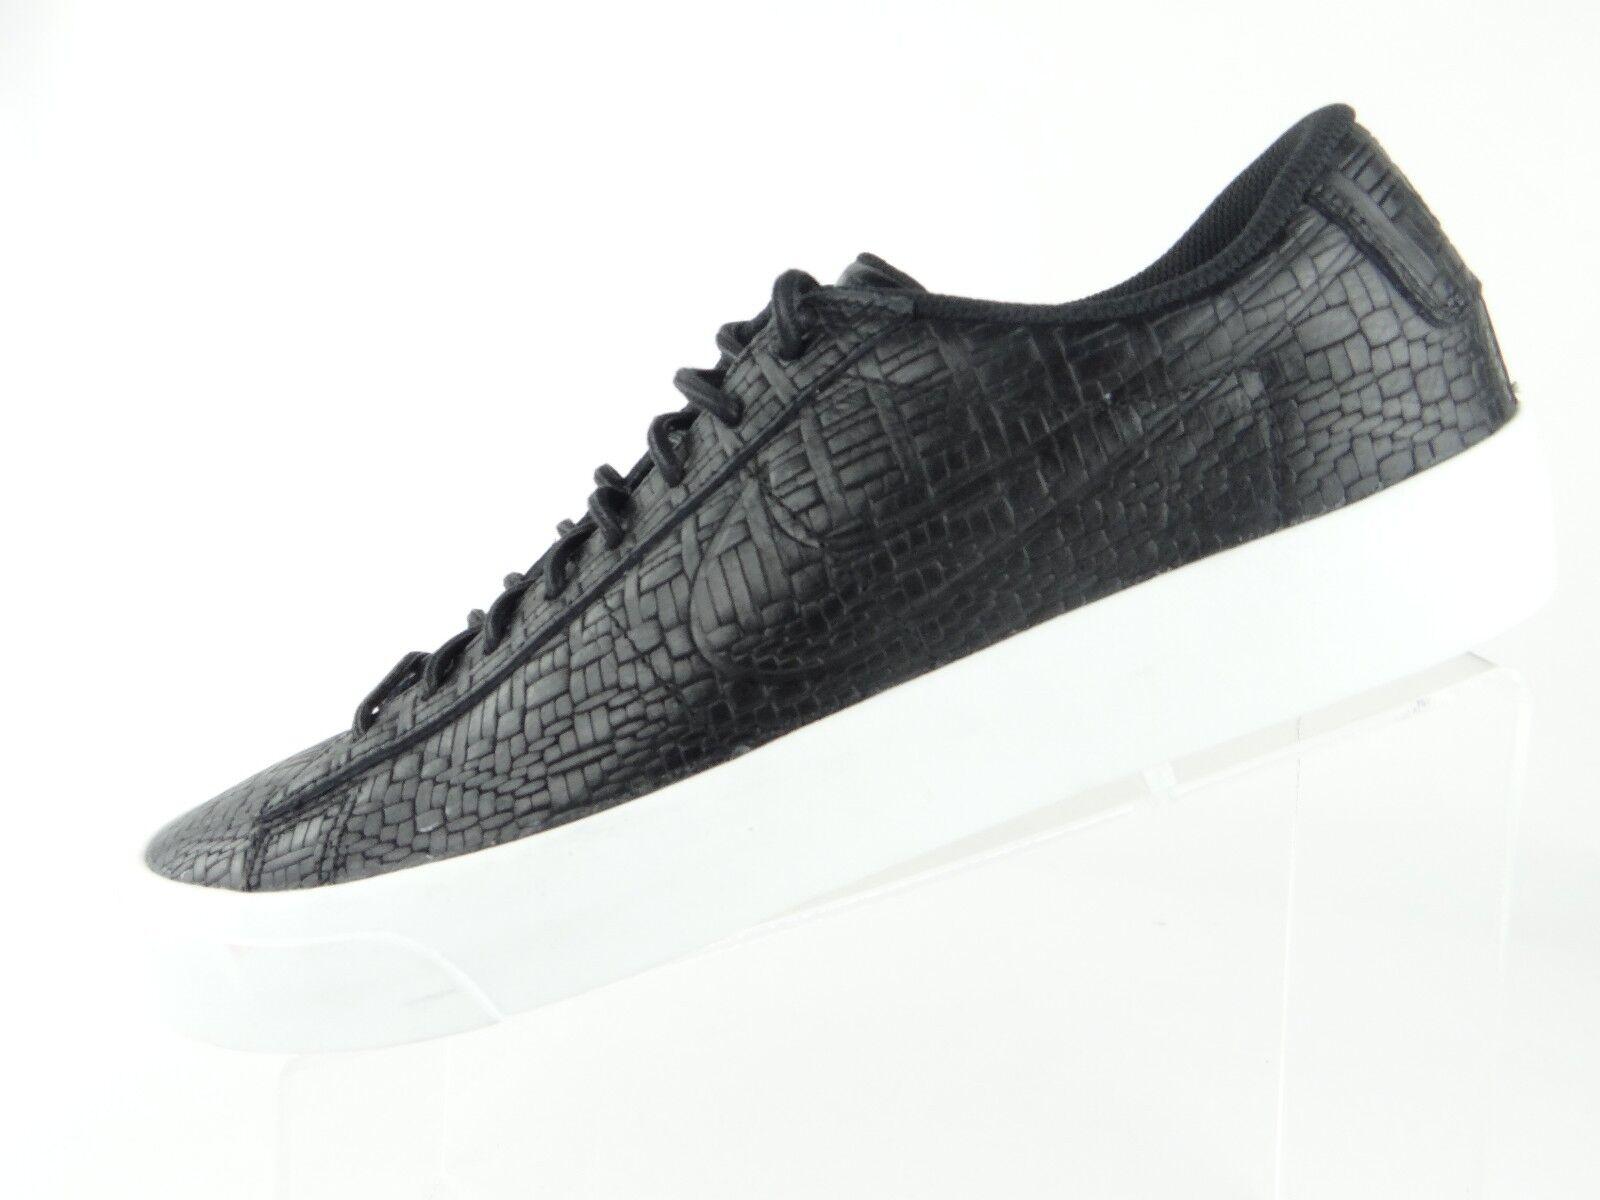 Nike Blazer Studio Low Men's Size 9.5 Black White Croc Athletic Shoes 880872-001